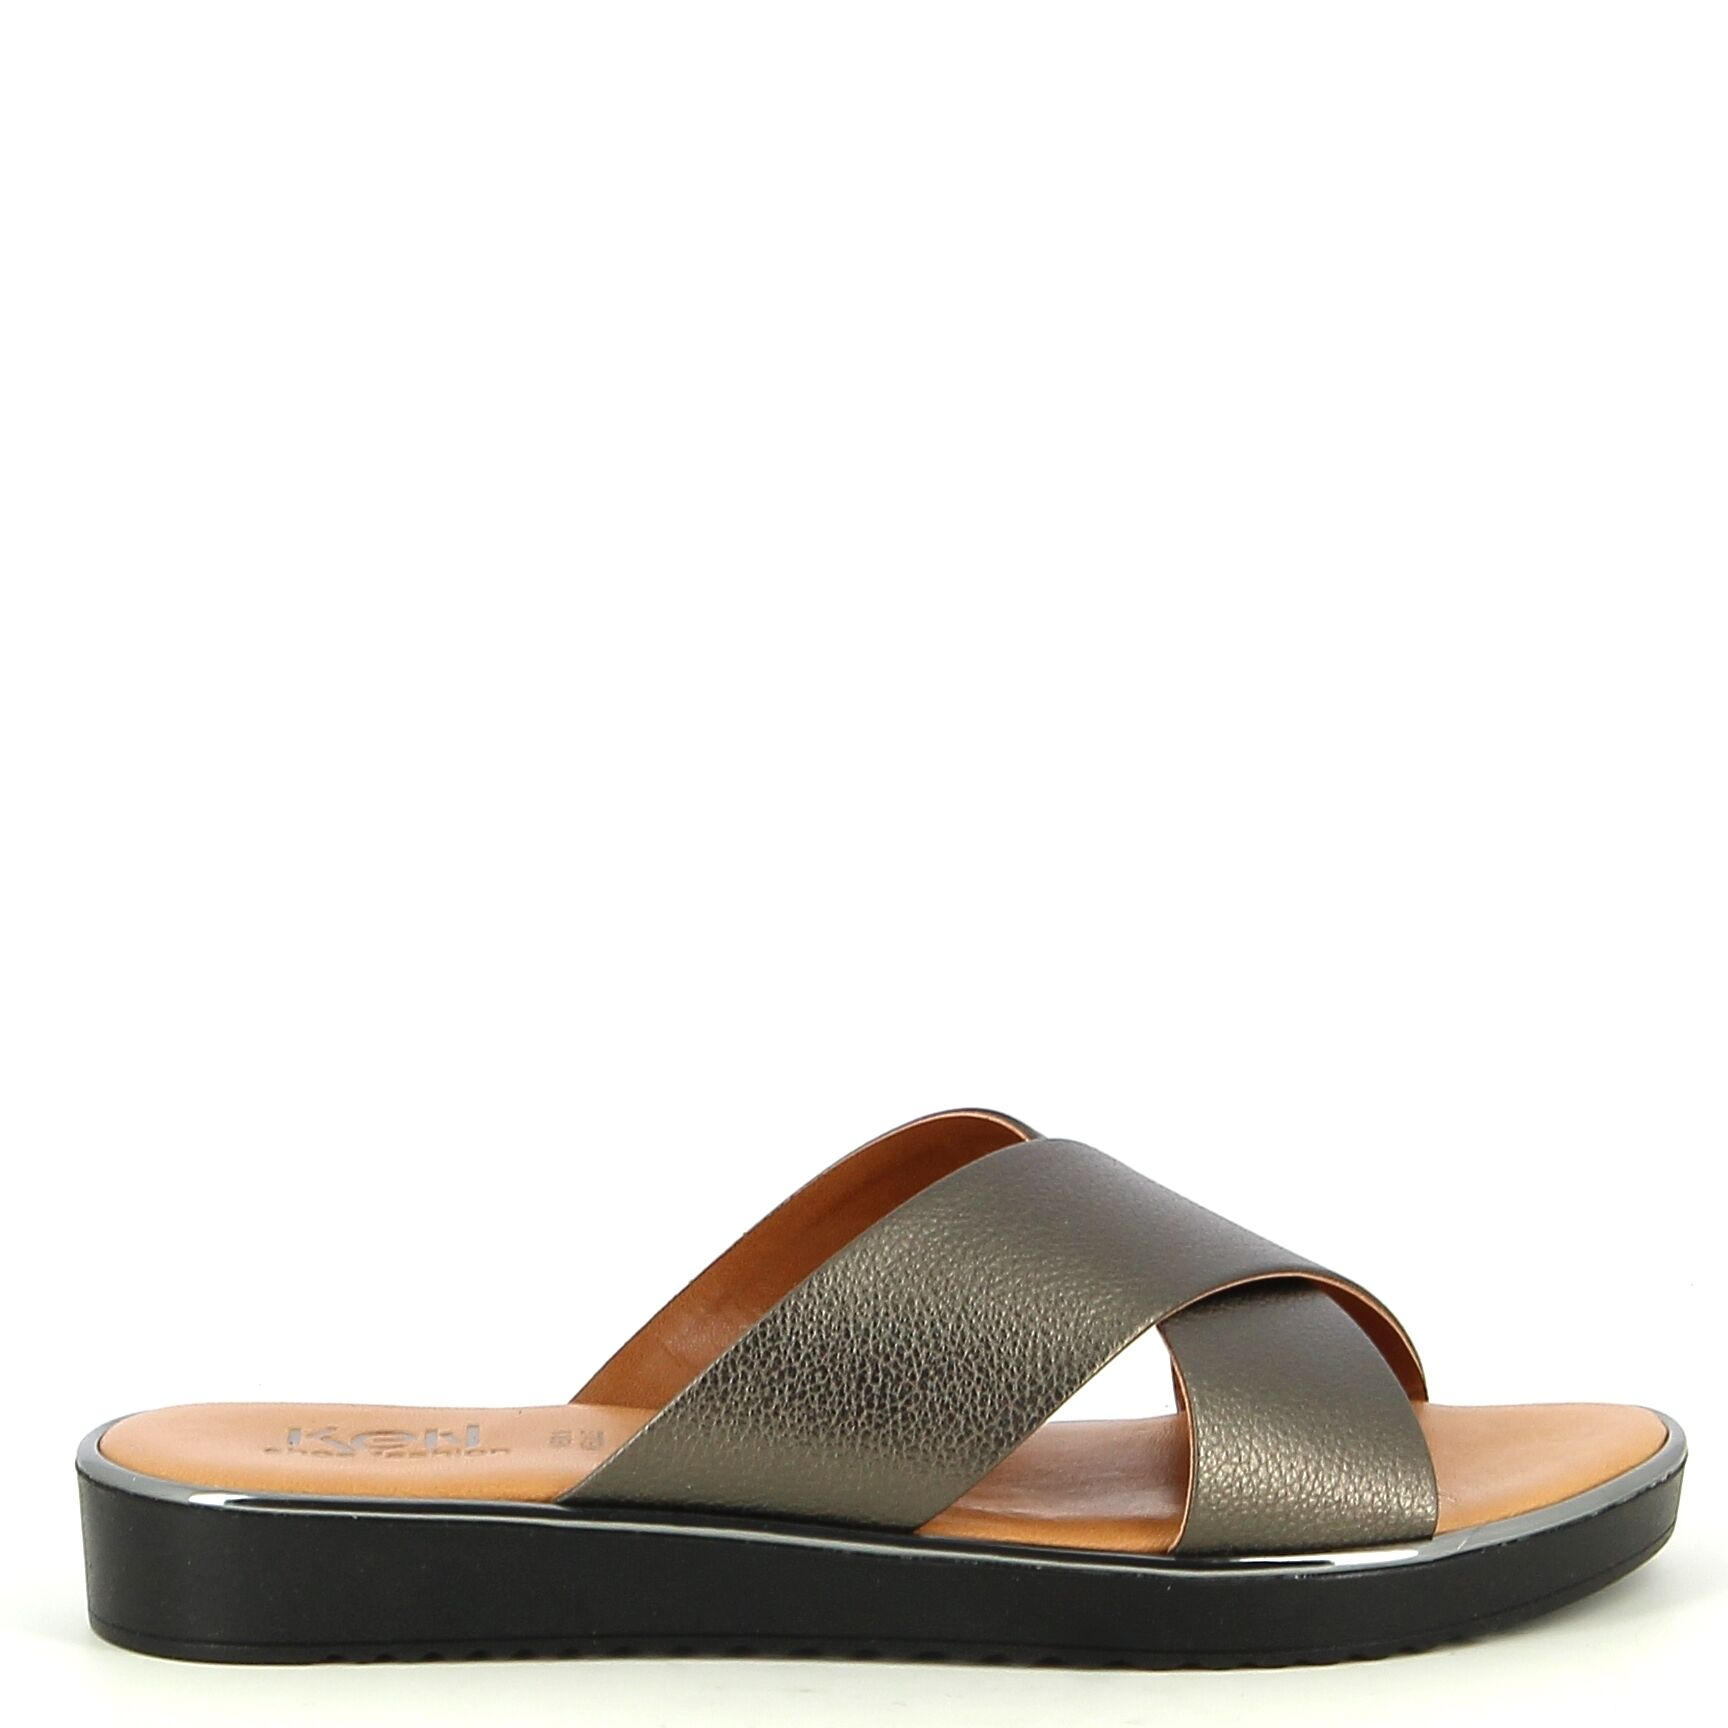 Ken Shoe Fashion - Chaussures Slip On - Plomb